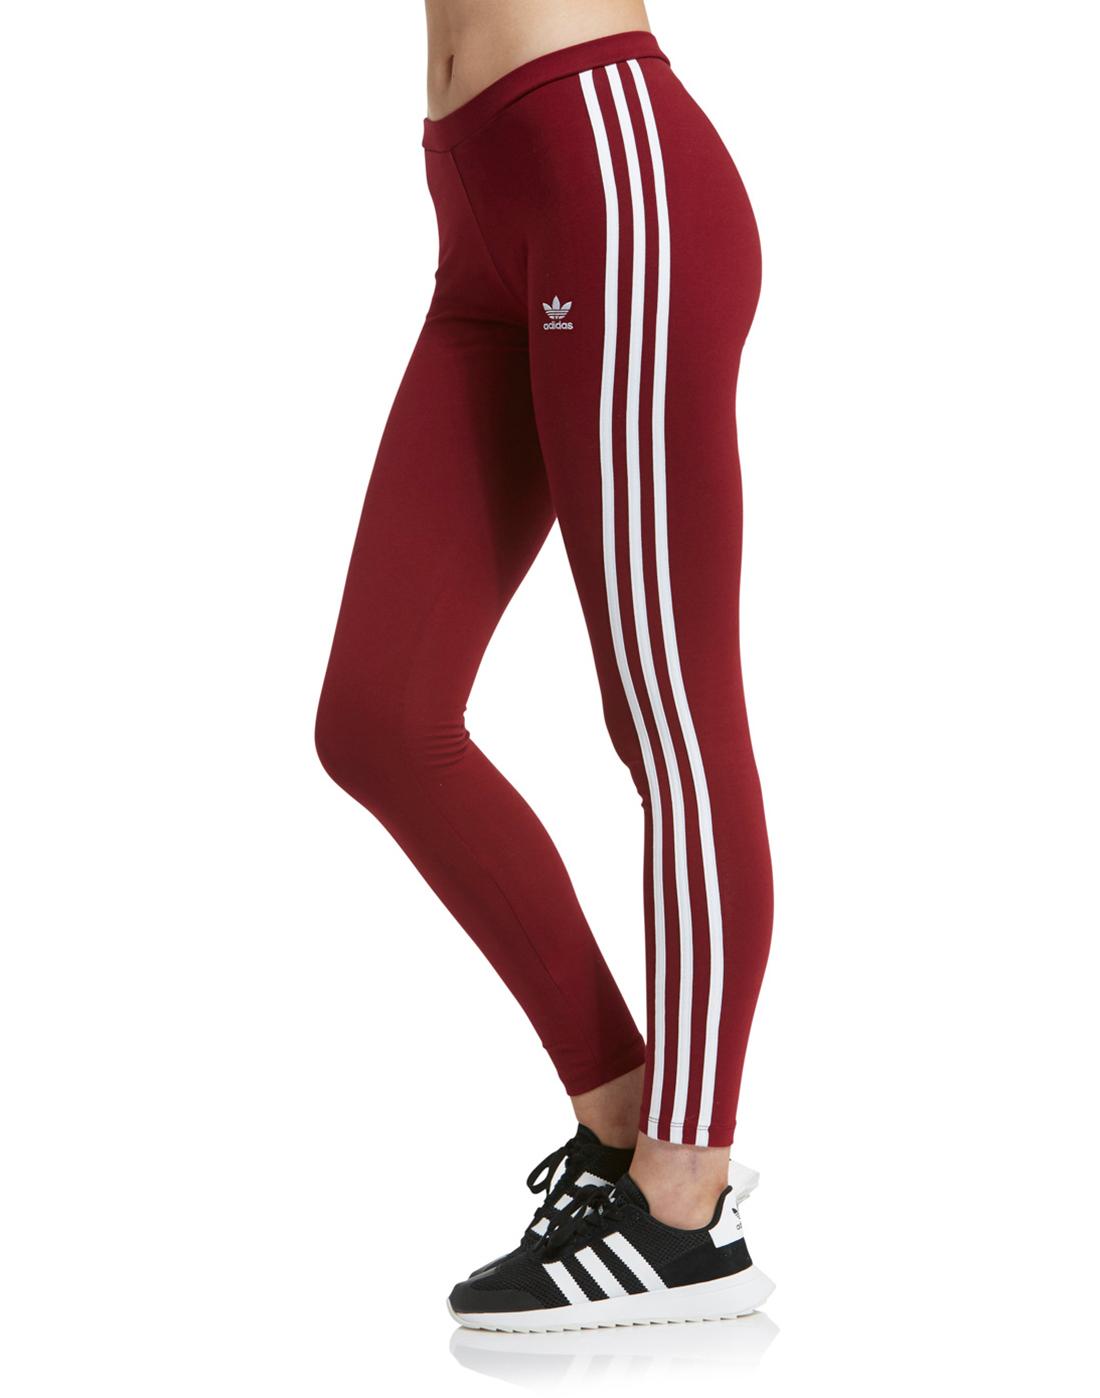 c1219ff44d6 adidas Originals Womens 3 Stripe Legging | Life Style Sports